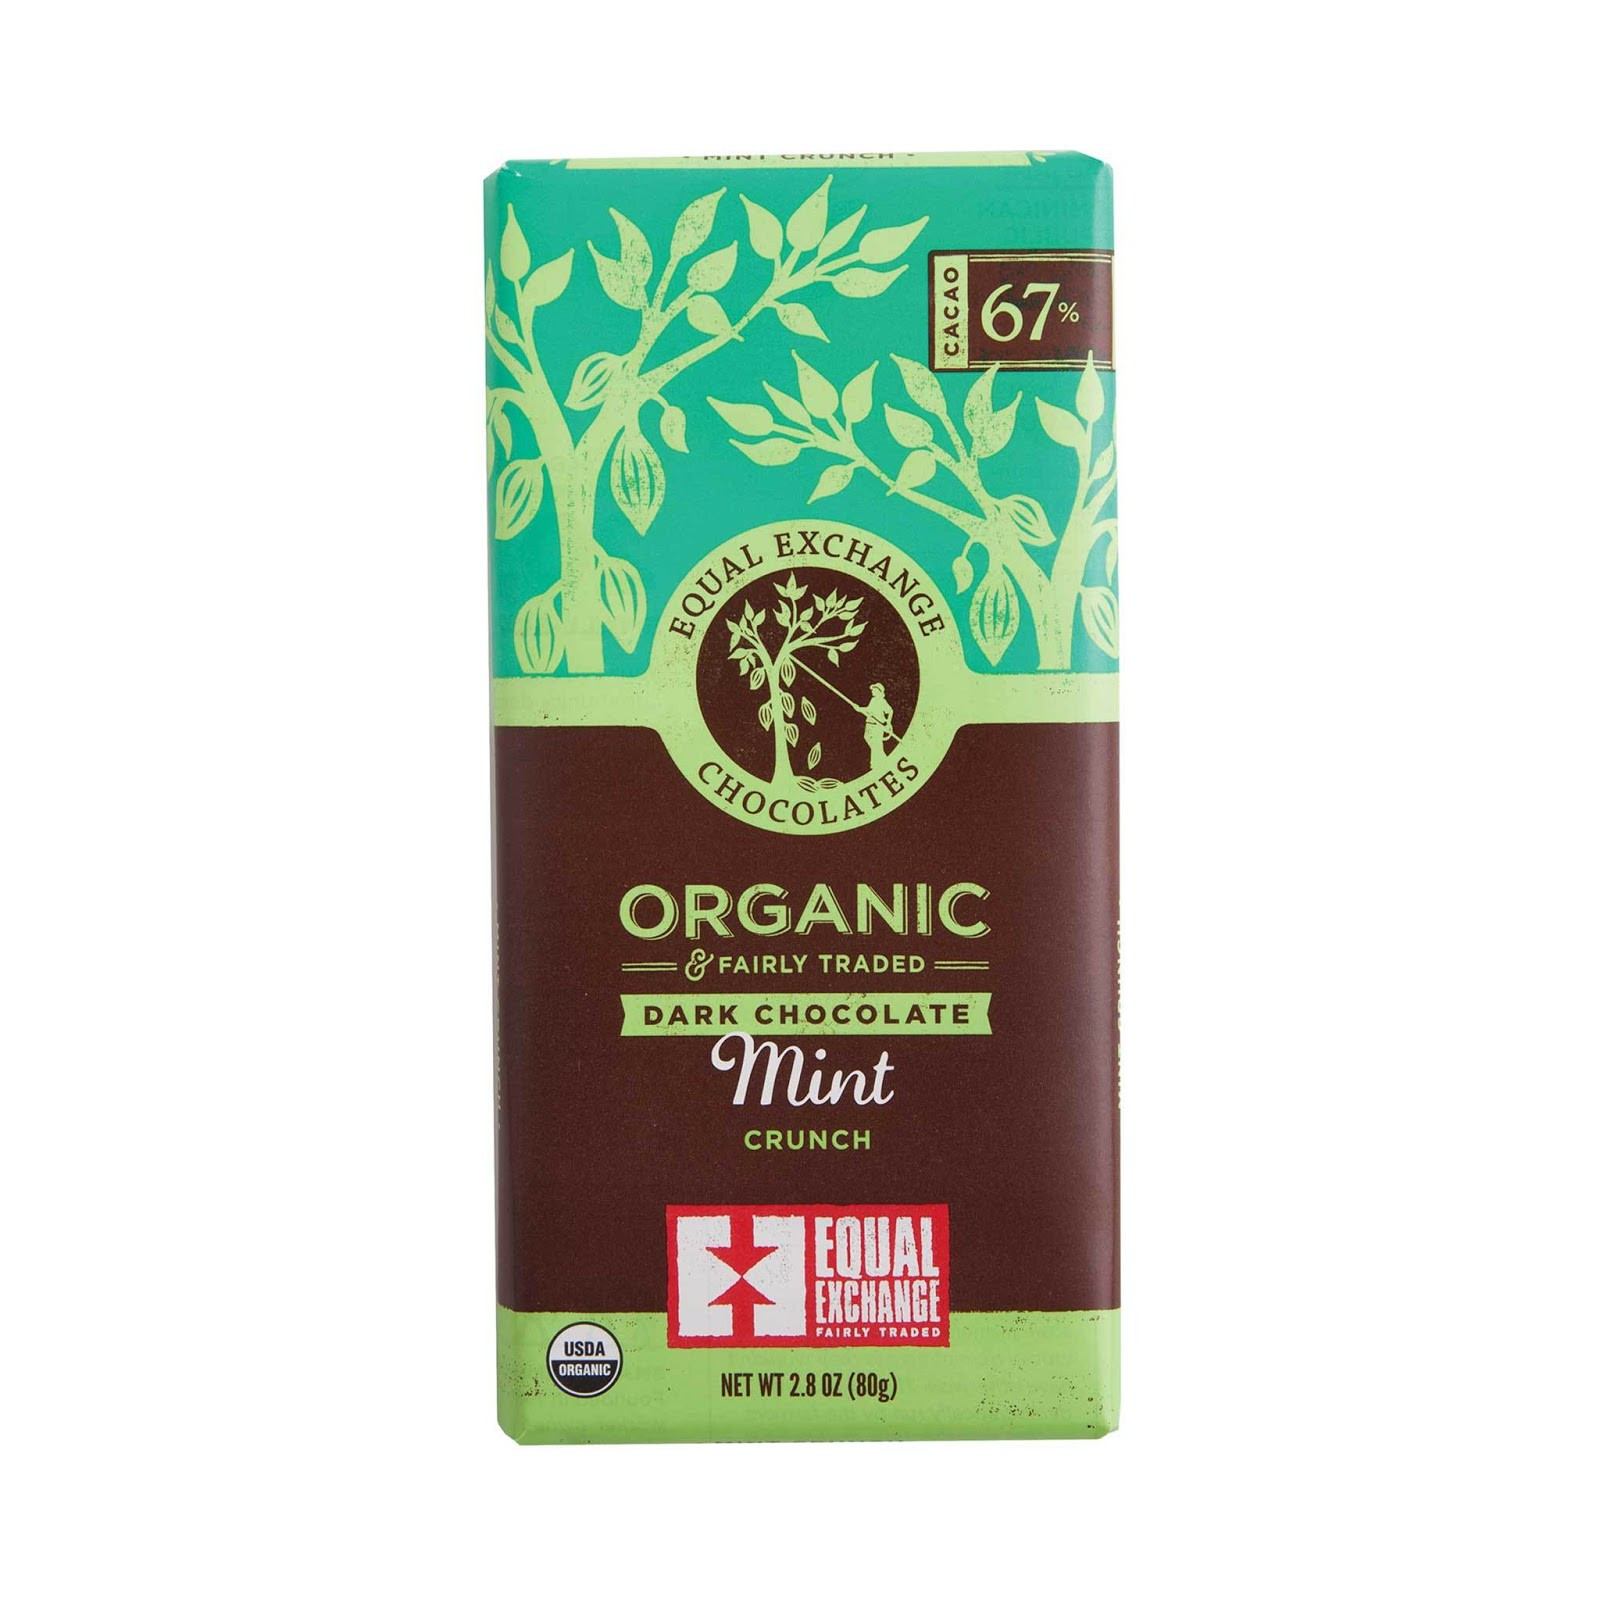 Organic Dark Chocolate Mint Crunch {67% Cacao}